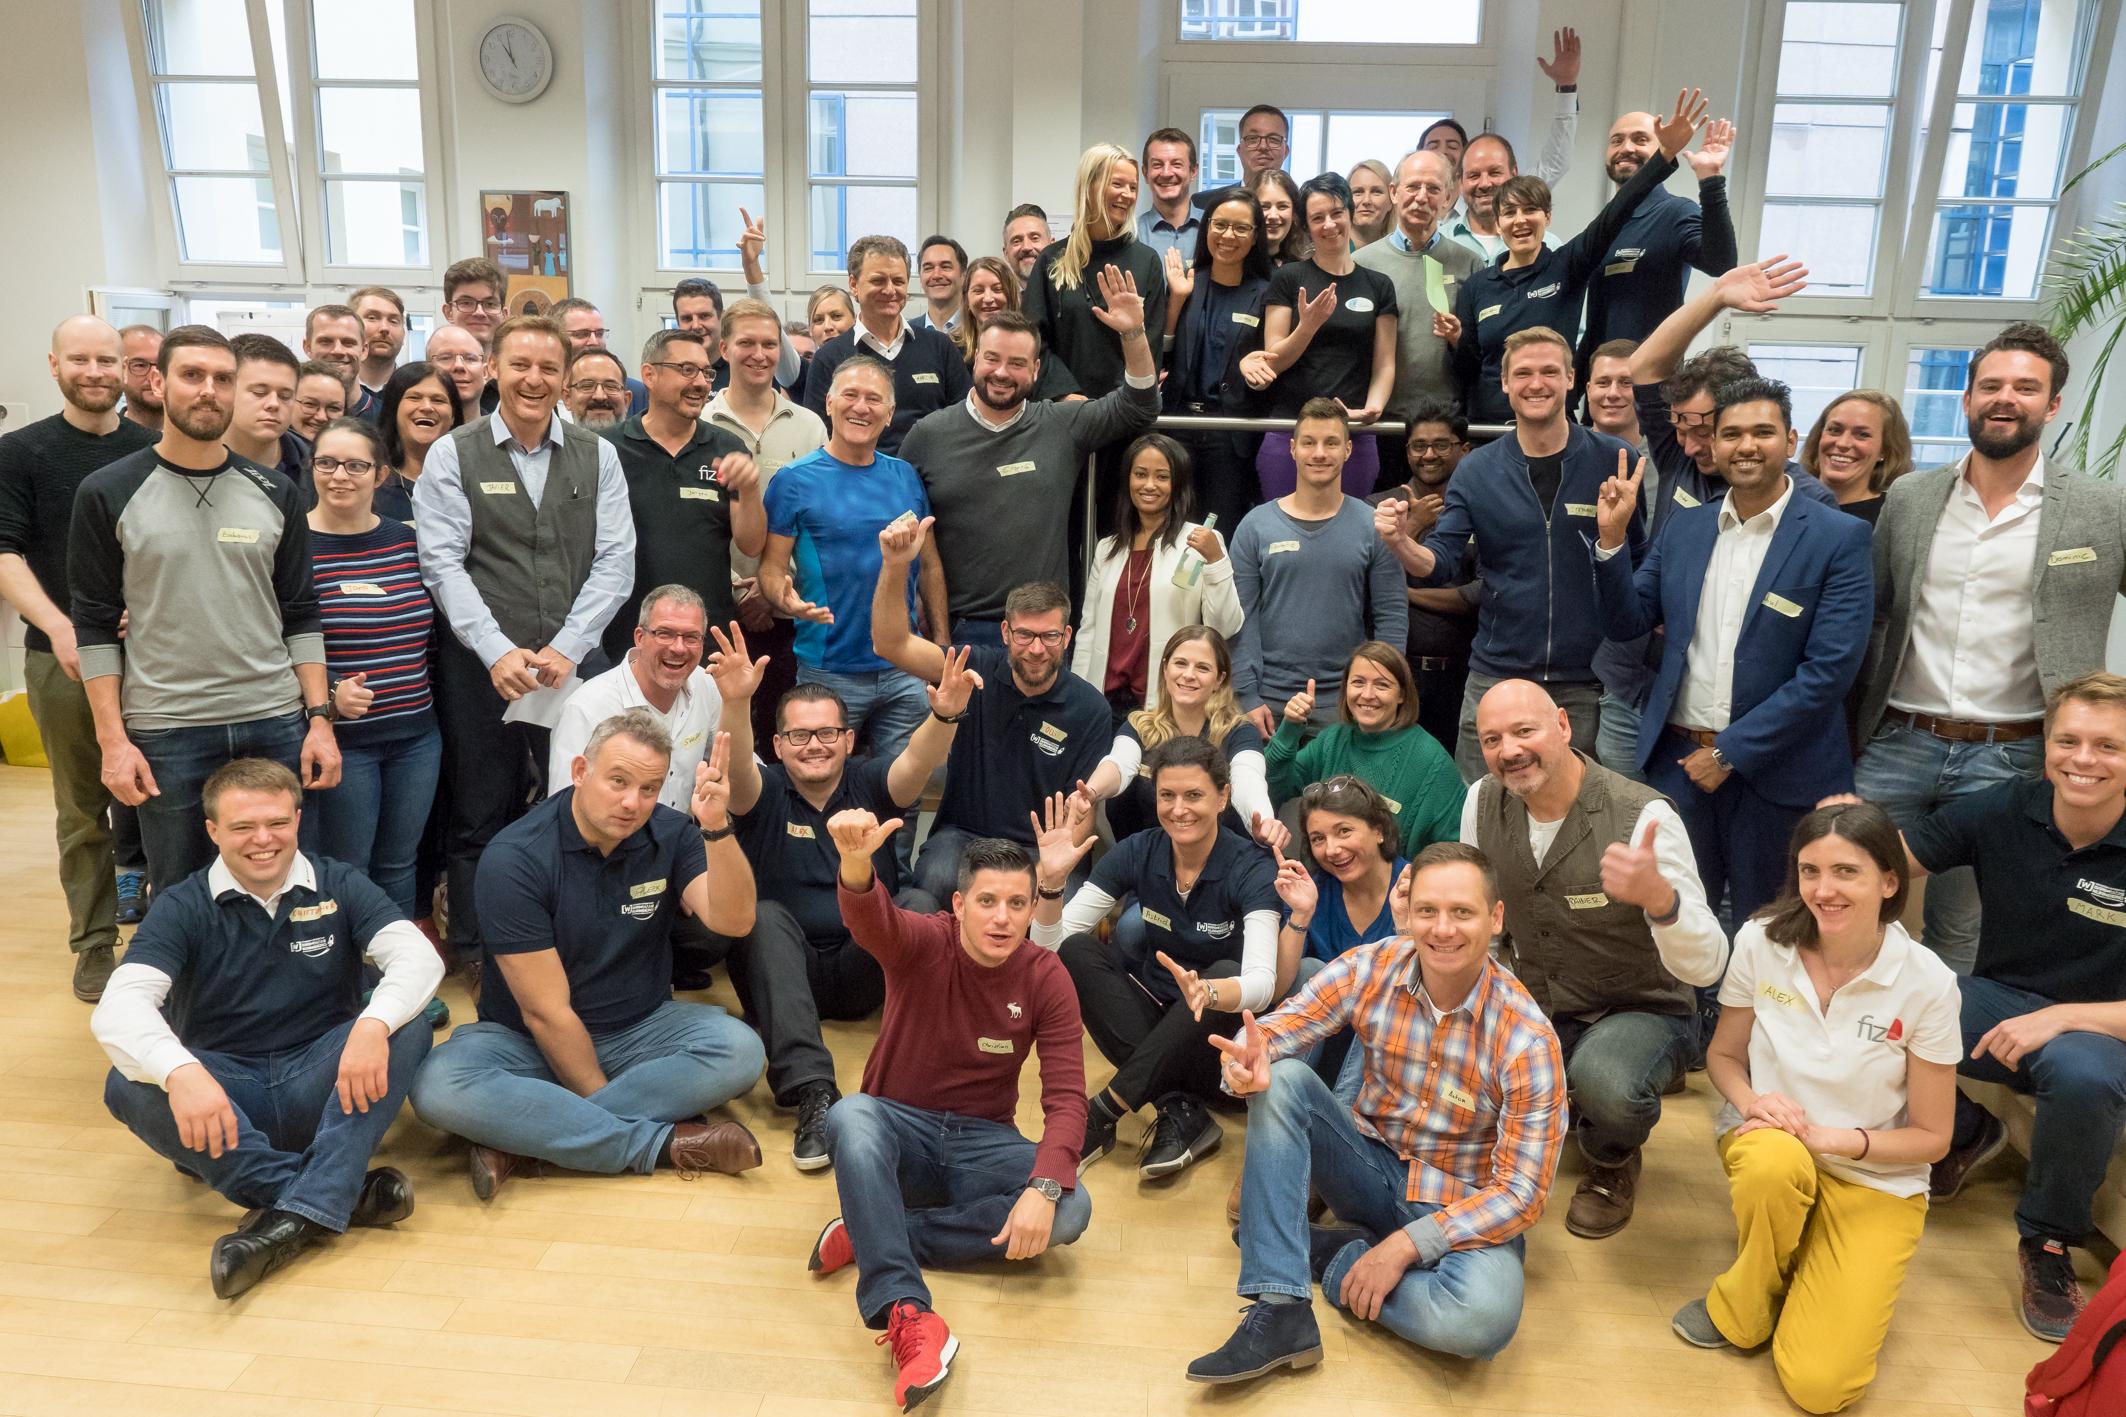 Gründer Barcamp 2019